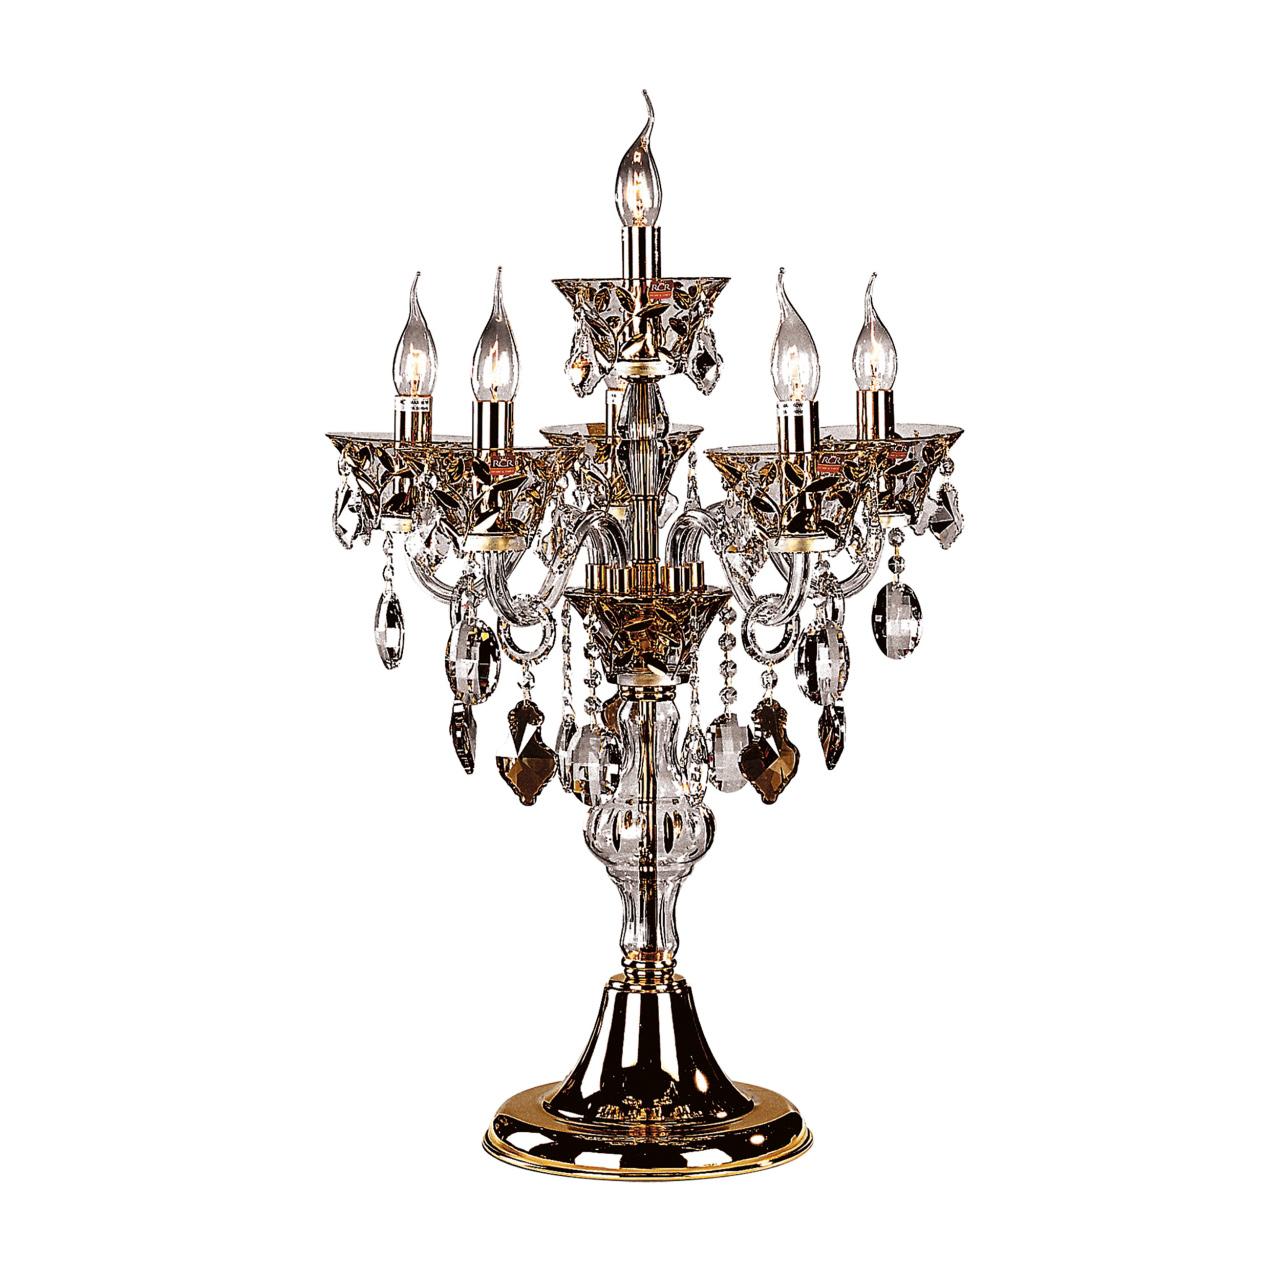 Настольная лампа Tesoro 6х60W E14 24К золото Osgona 710952